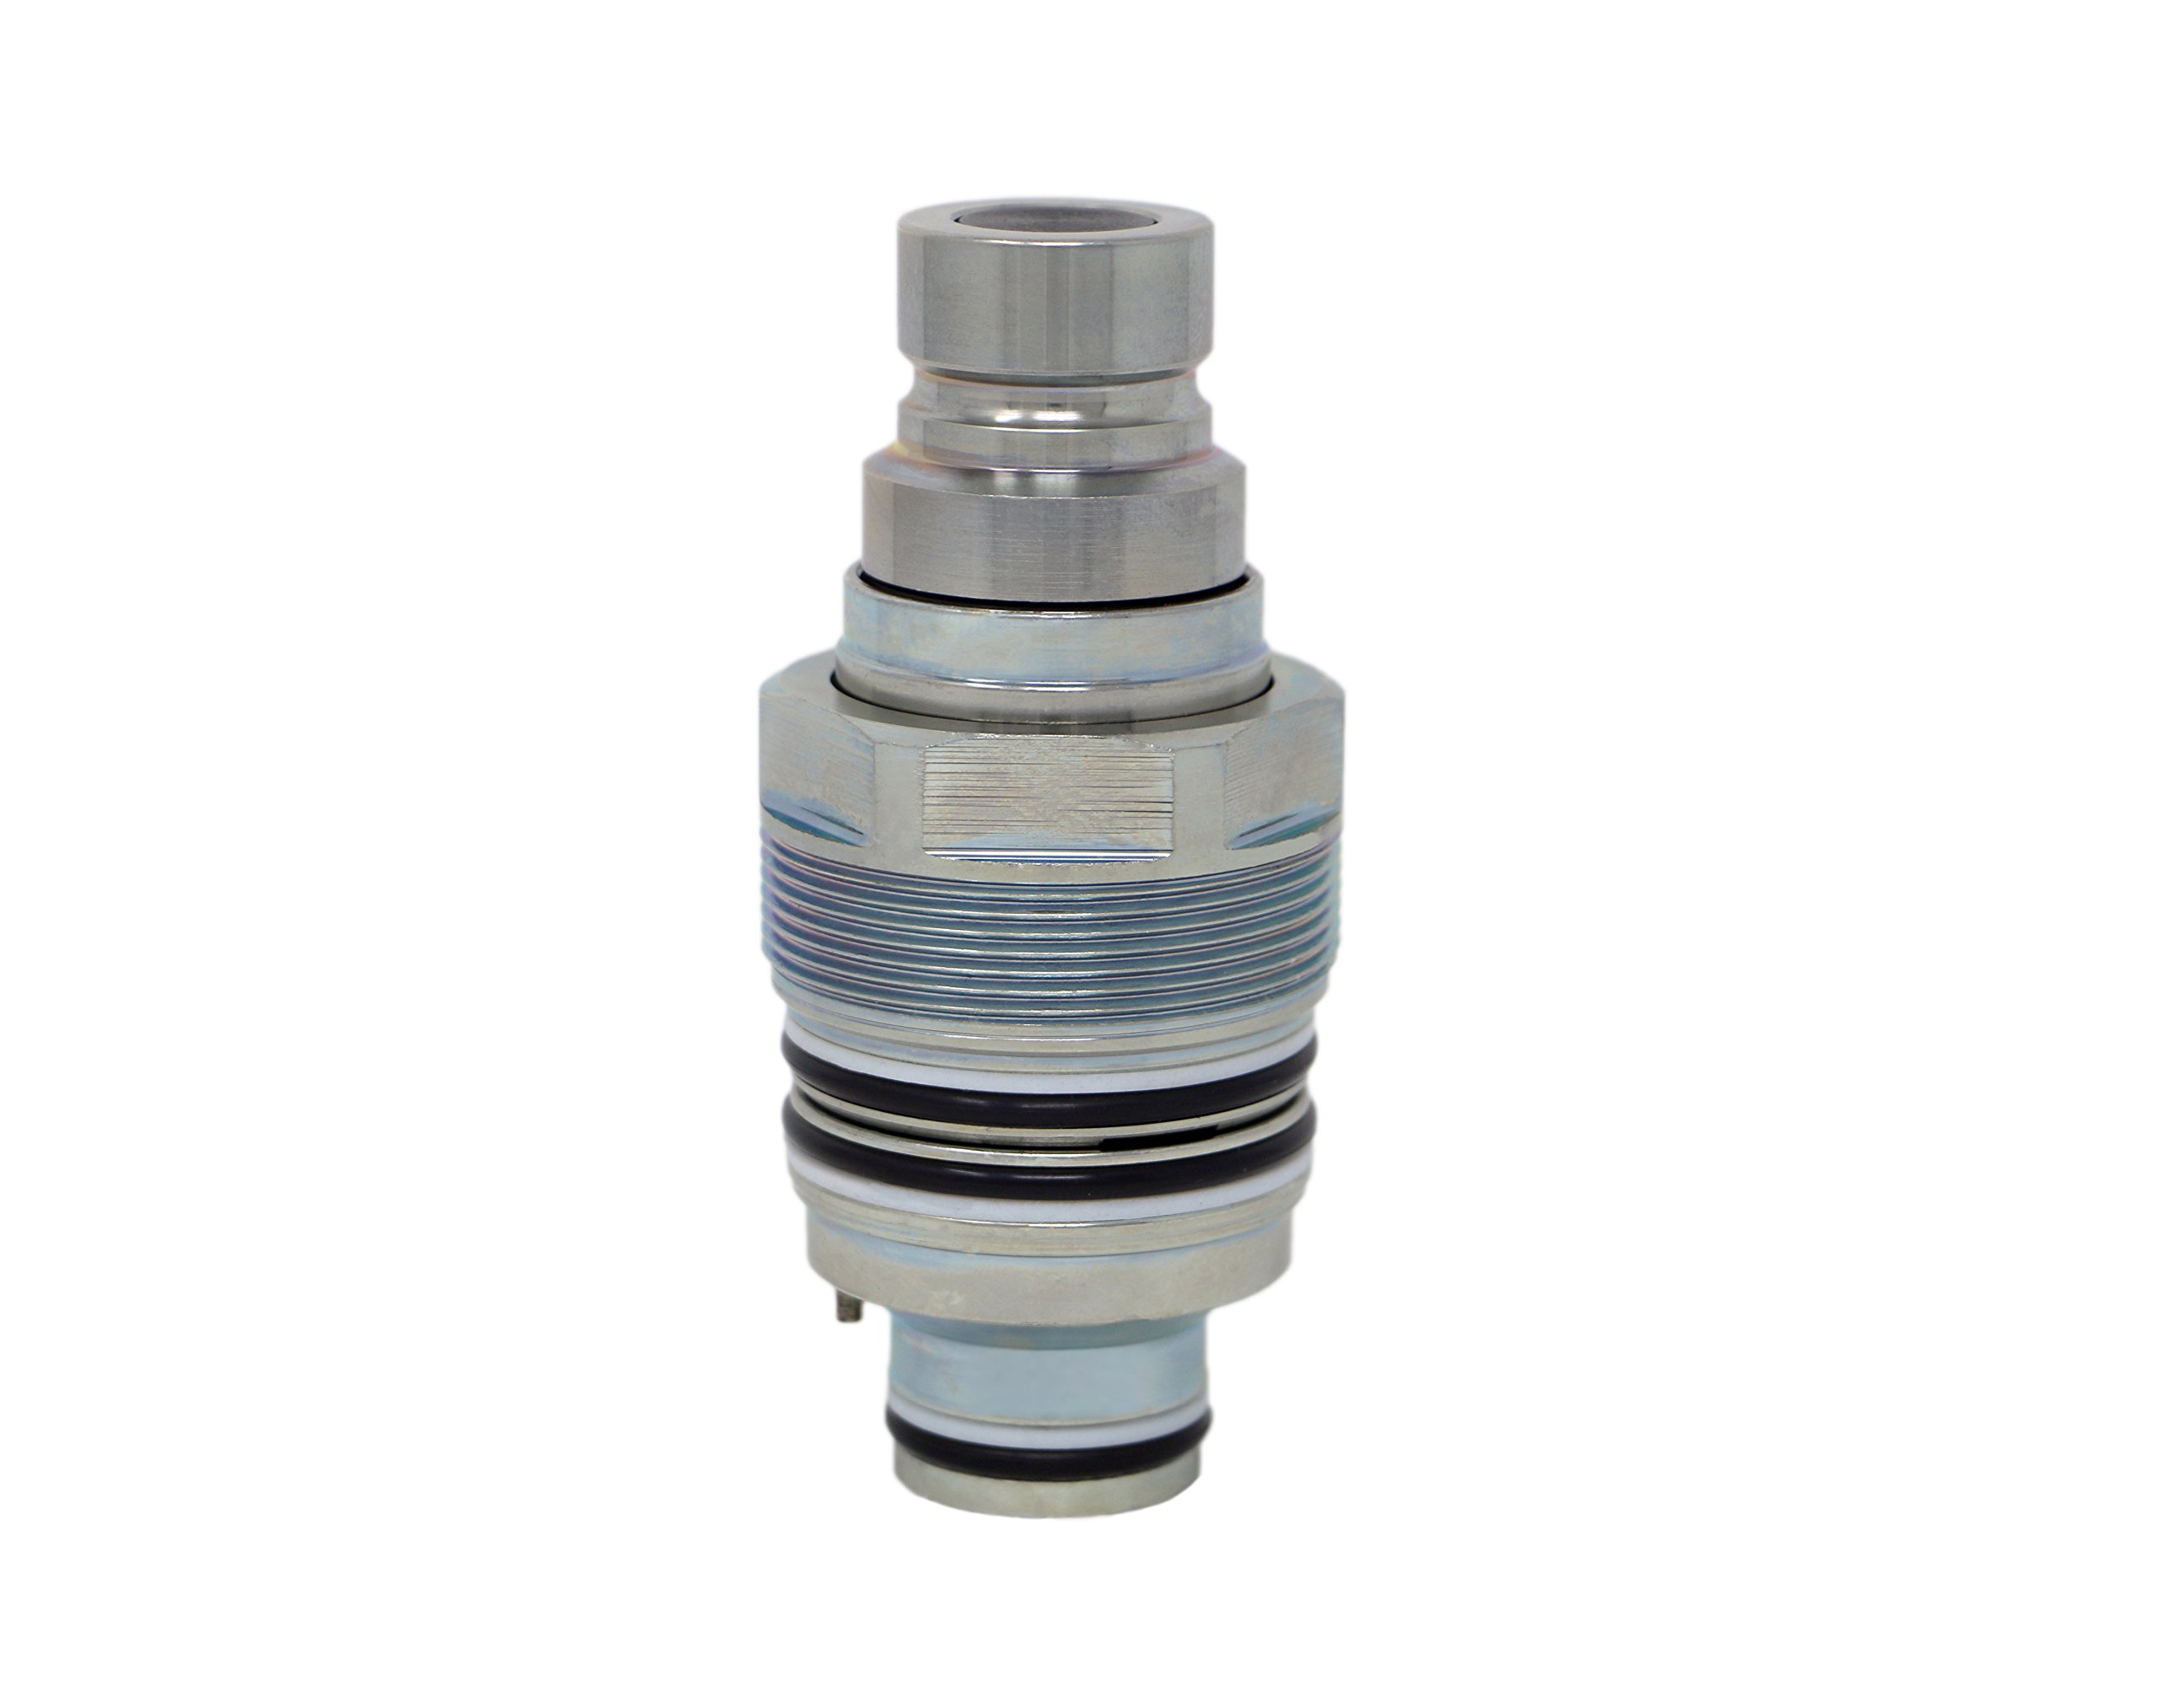 TL61 FFI Cartridge Male Coupler 1/2 Body Dash 12 Flat Face ISO 16028 Coupling for 4BD4FI Manifold Bobcat Skid Steer